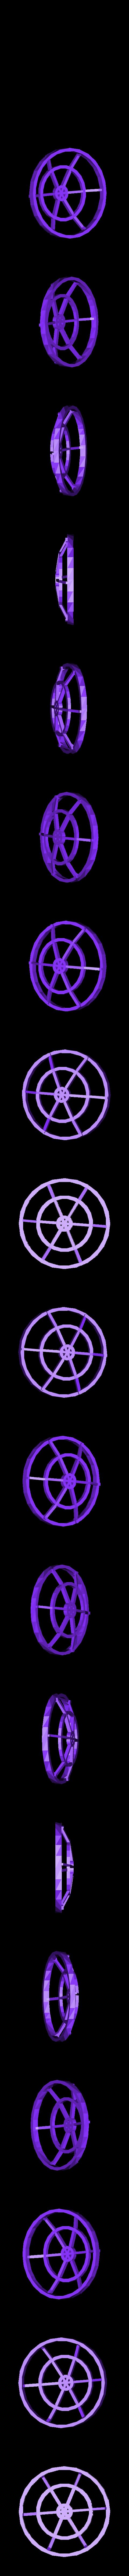 Mariner_Dish.stl Download free STL file Mariner • 3D printable object, Slagerqod